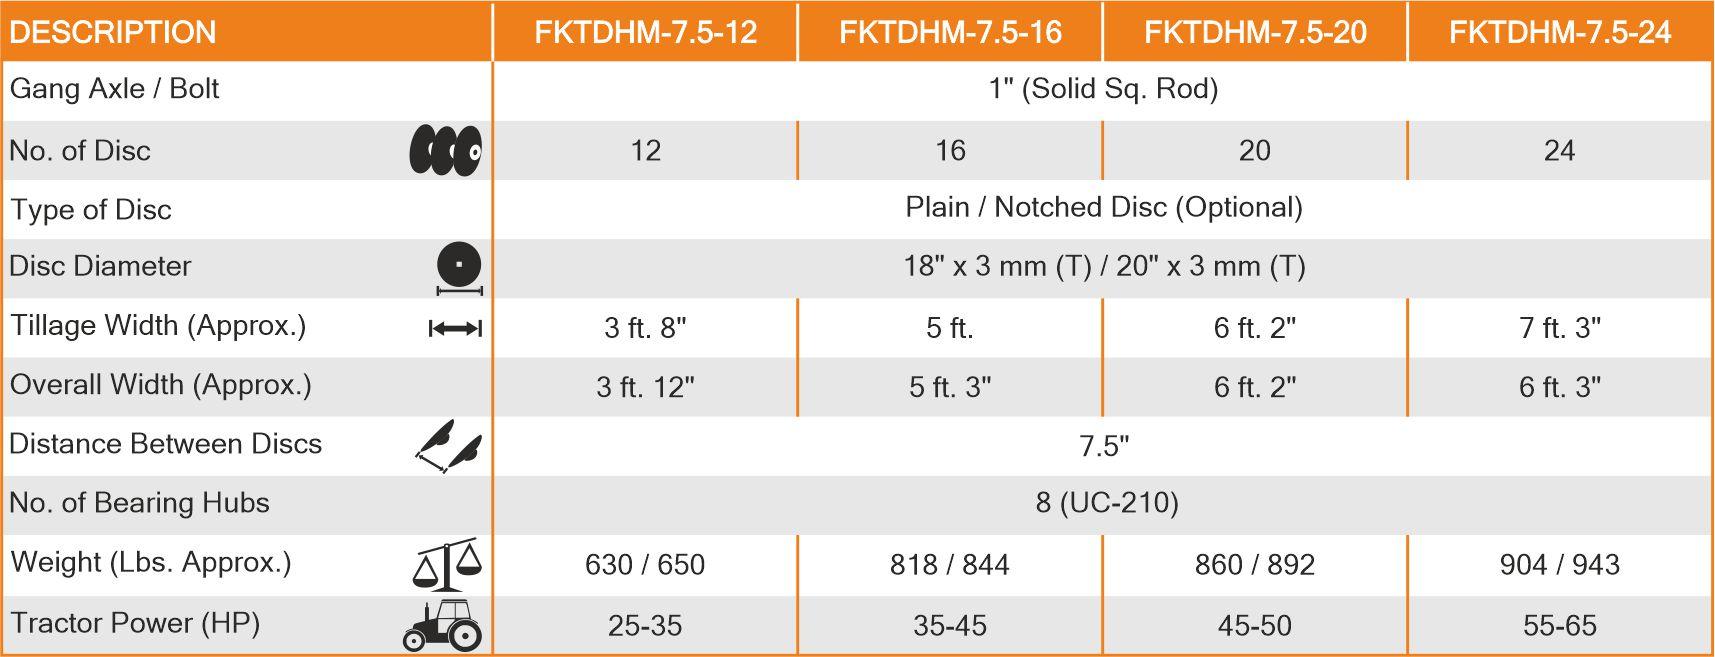 Tandem Disc Harrow Light Series Spectifications